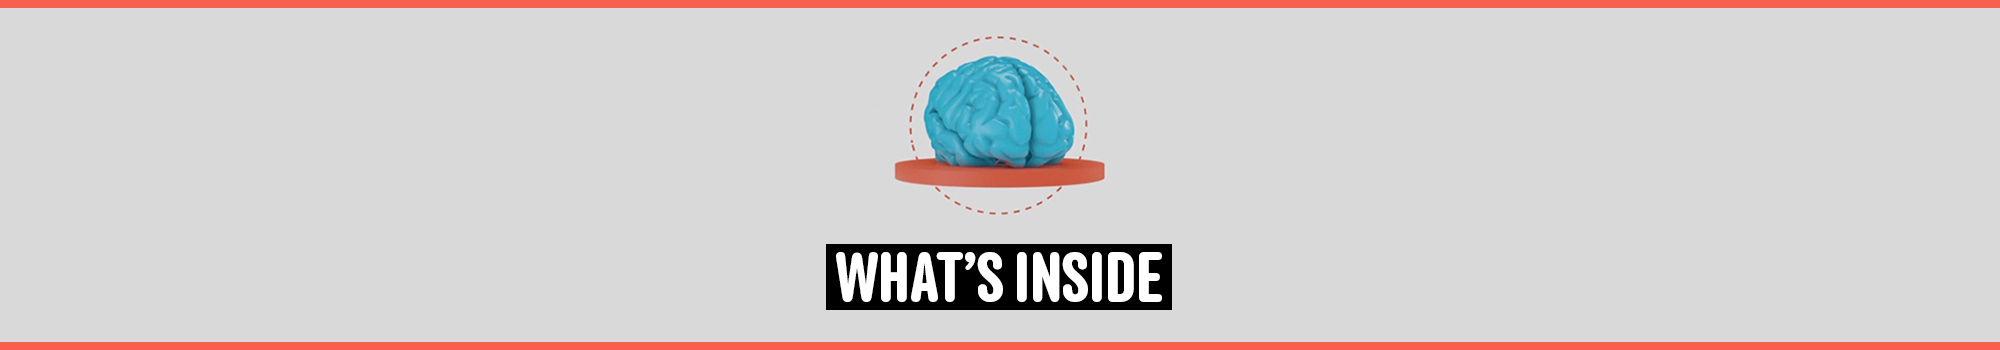 What's Inside a Flu Shot?